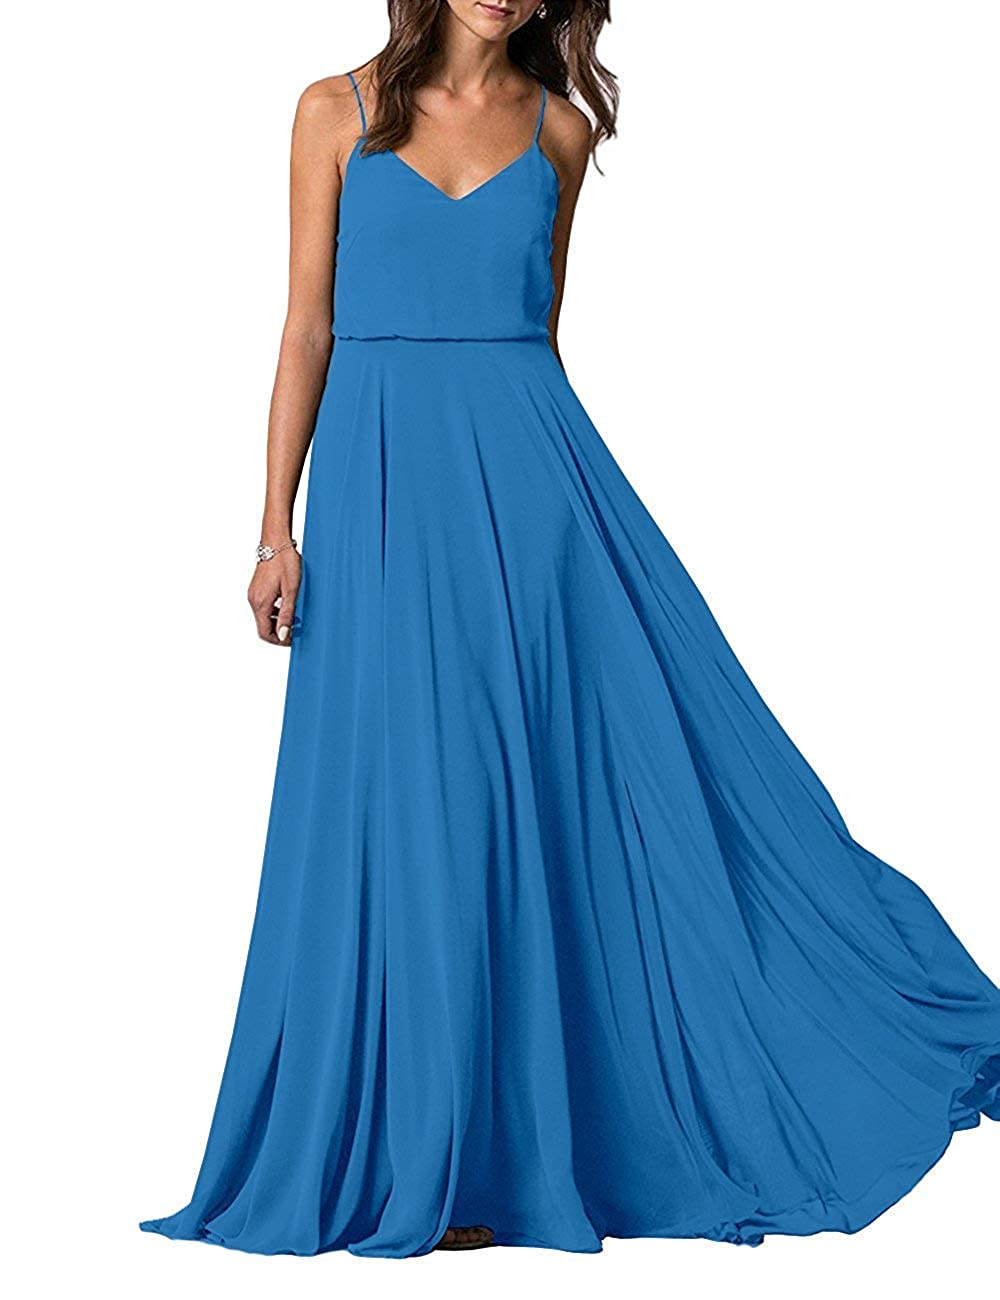 bluee YUSHENGSM Spaghetti Straps VNeck Long Bridesmaid Dress Wedding Beach Prom Skirt